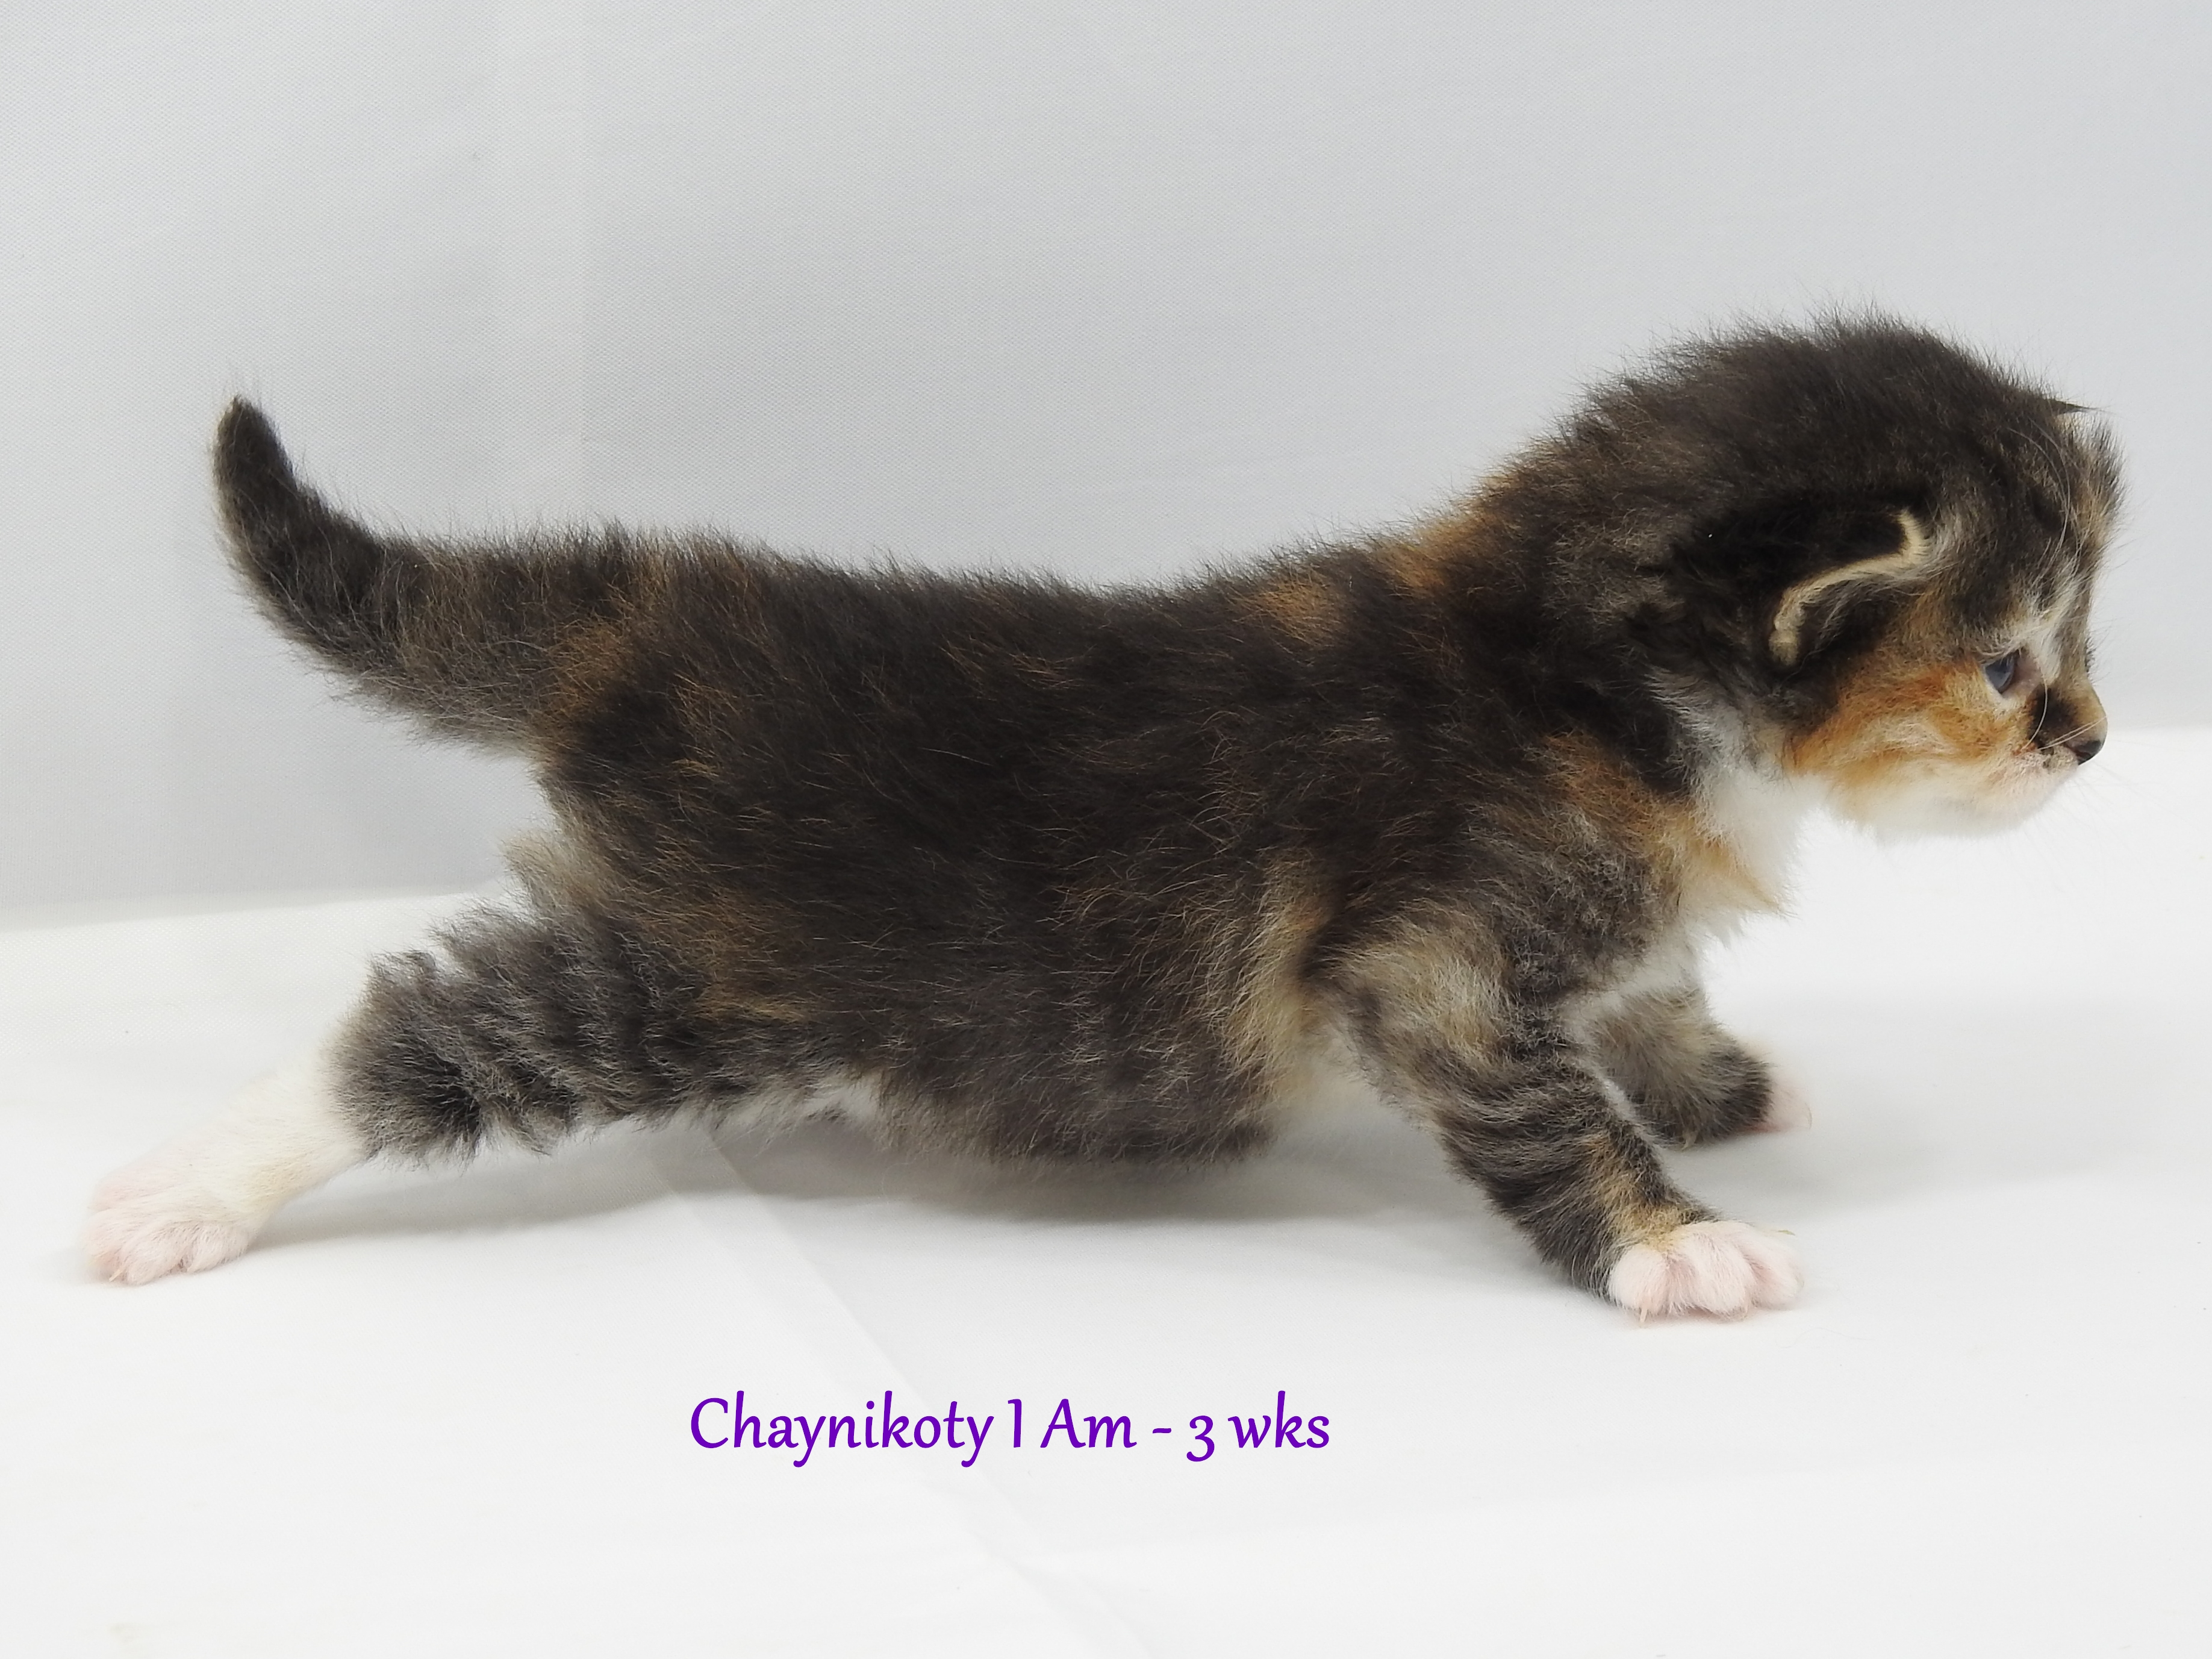 Chaynikoty I Am - 3 wks